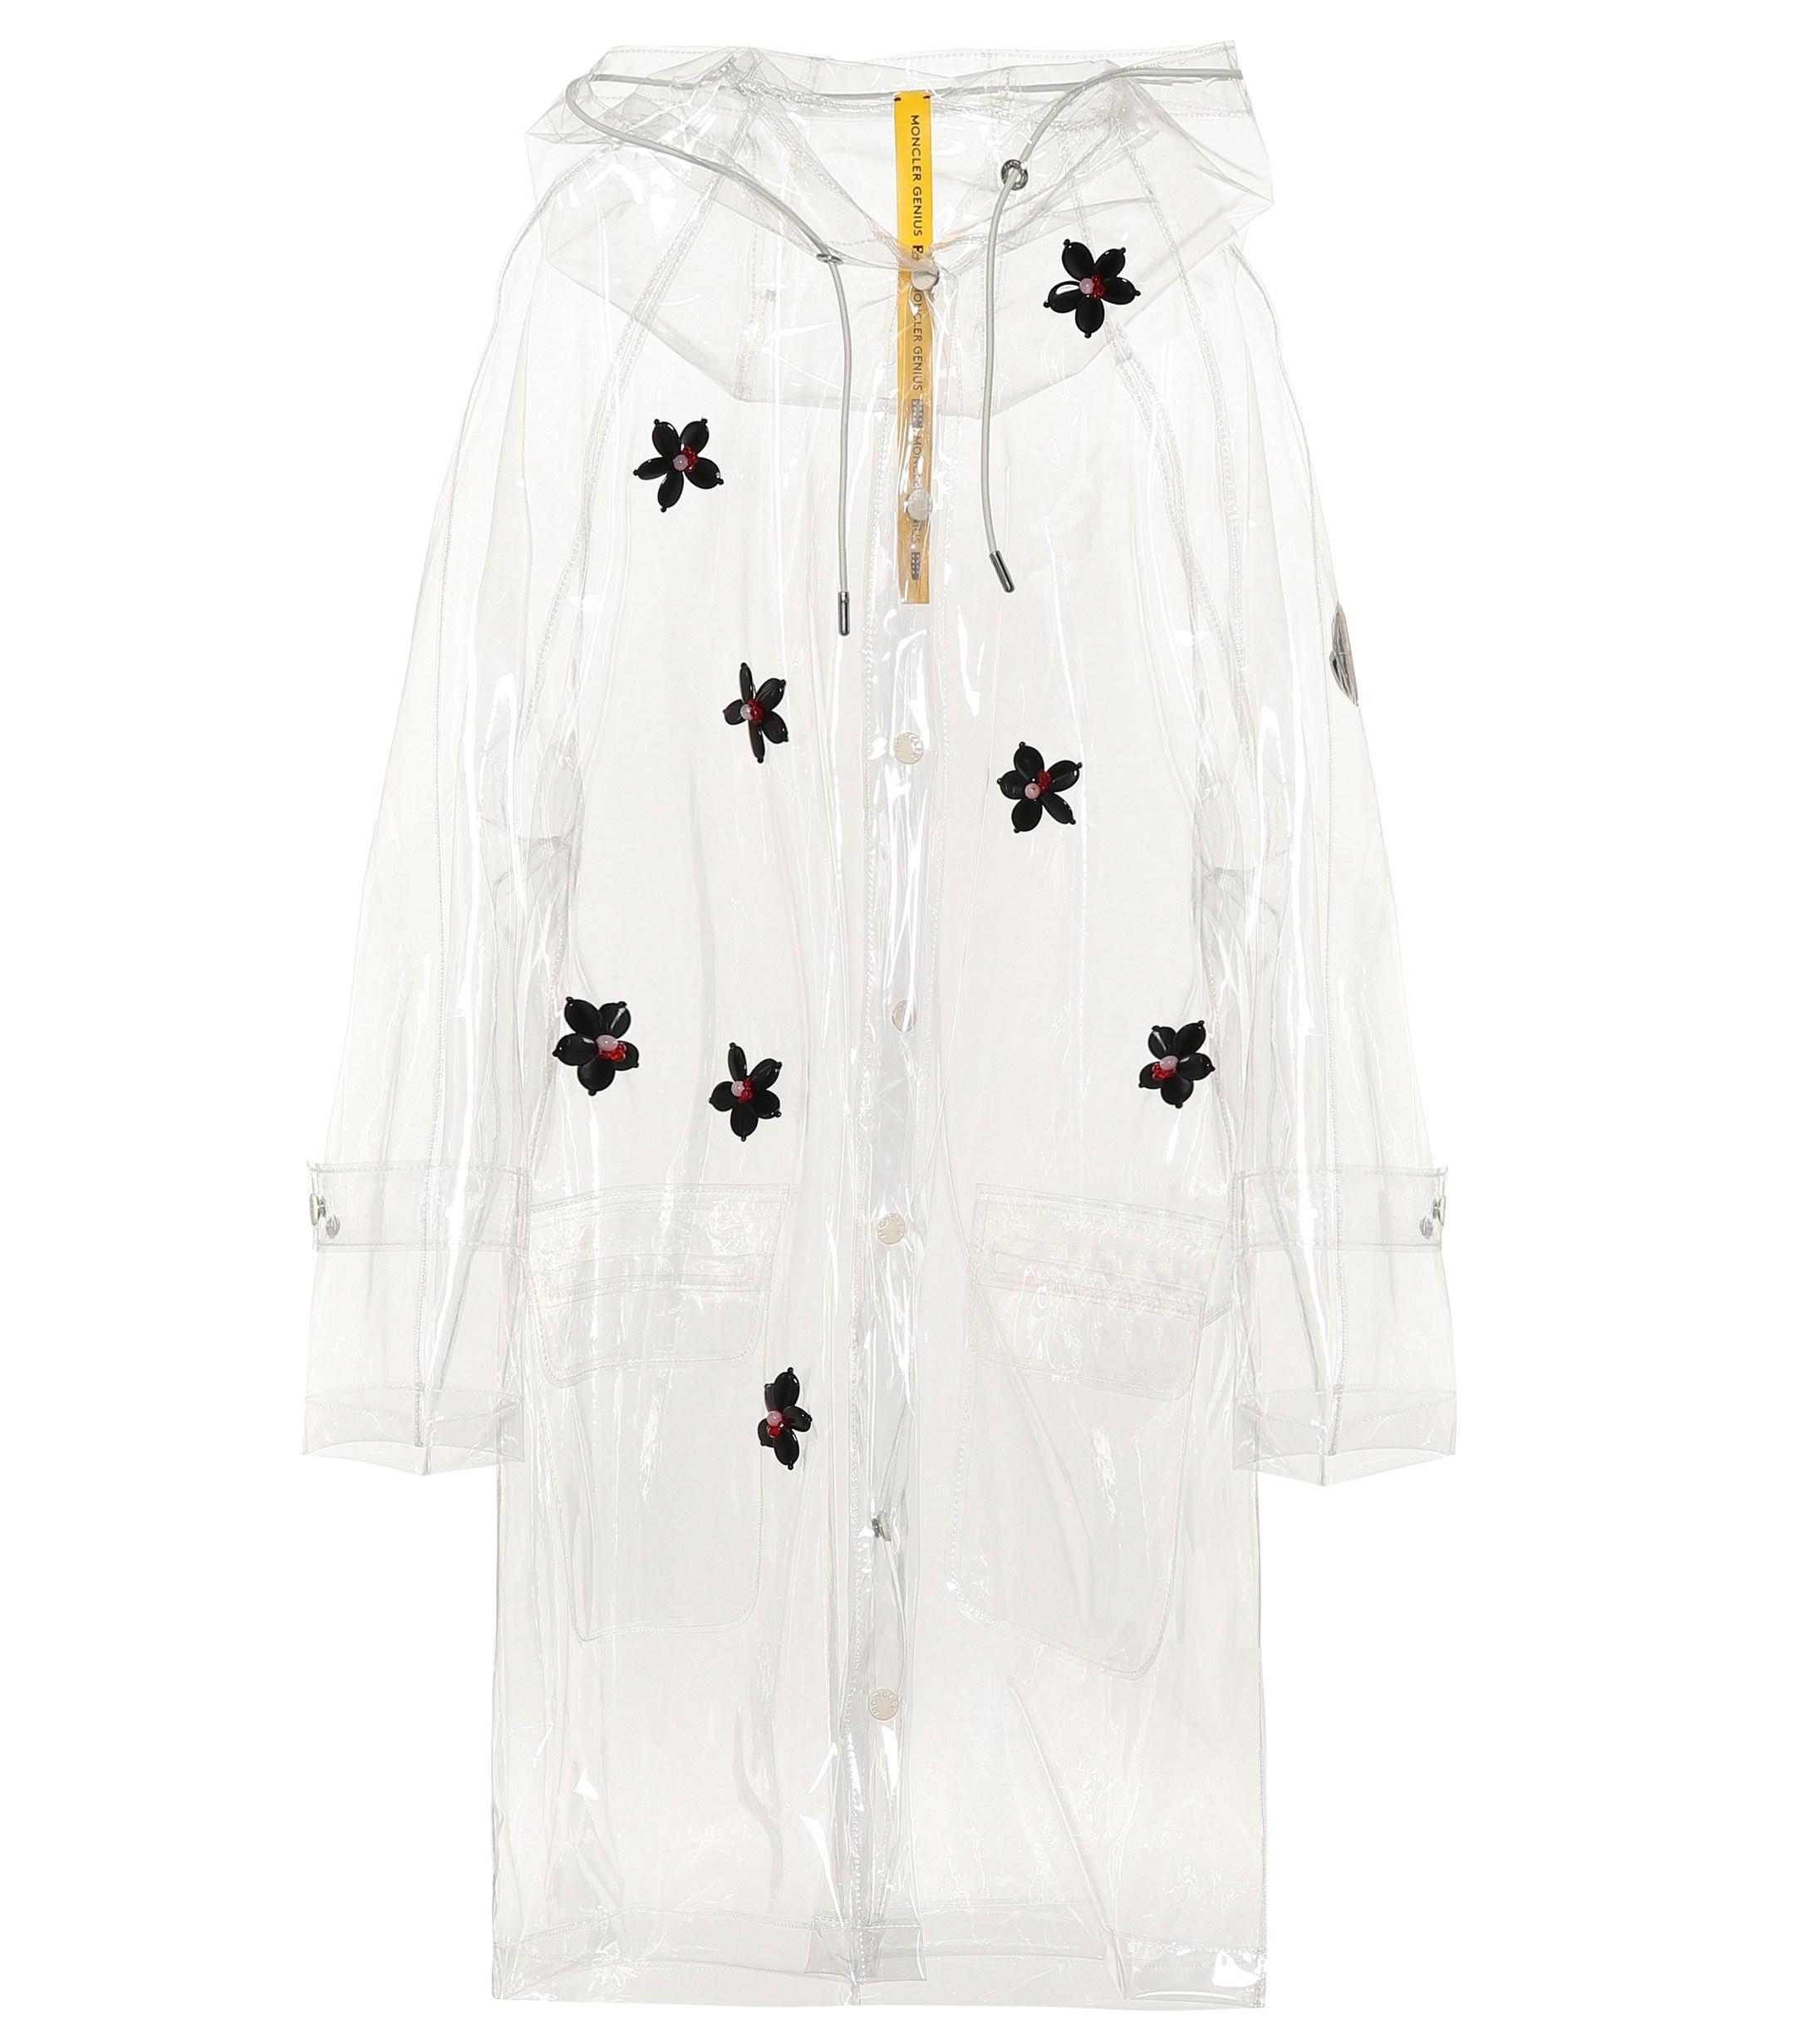 6cc6625ef Lyst - Moncler Genius 4 Moncler Simone Rocha Embellished Raincoat